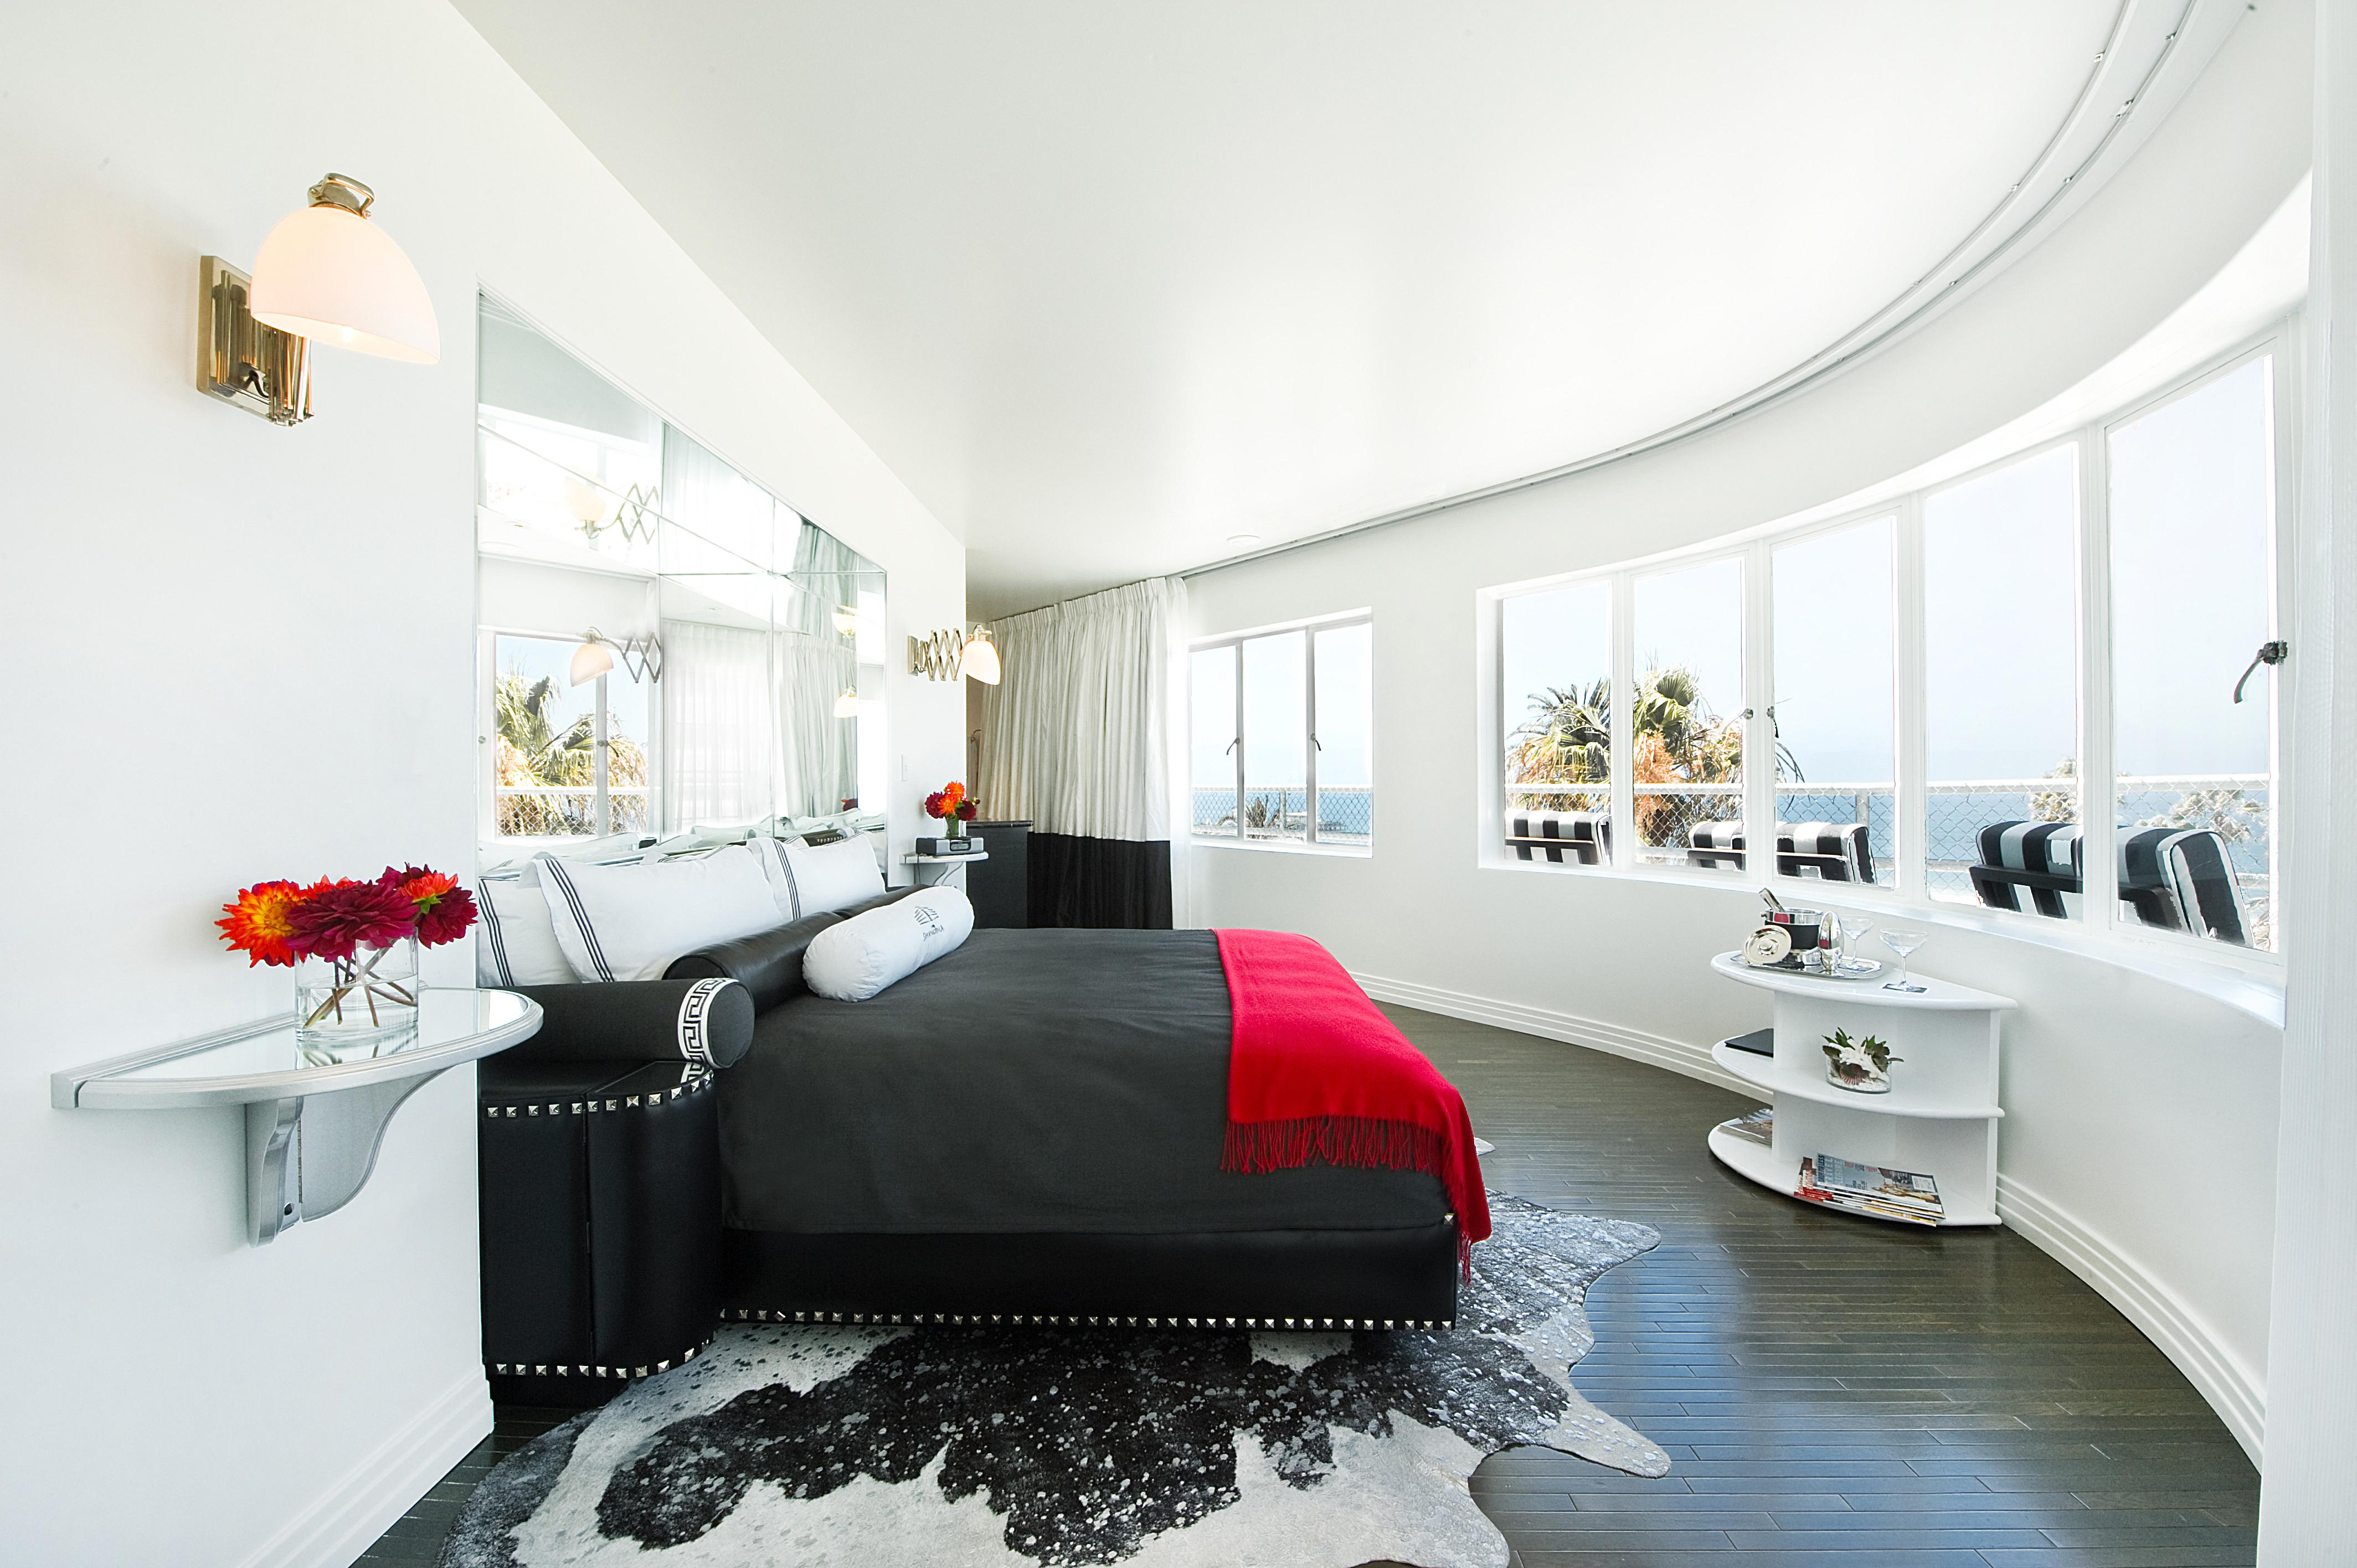 Rock & Roll suite at Shangri-La Santa Monica